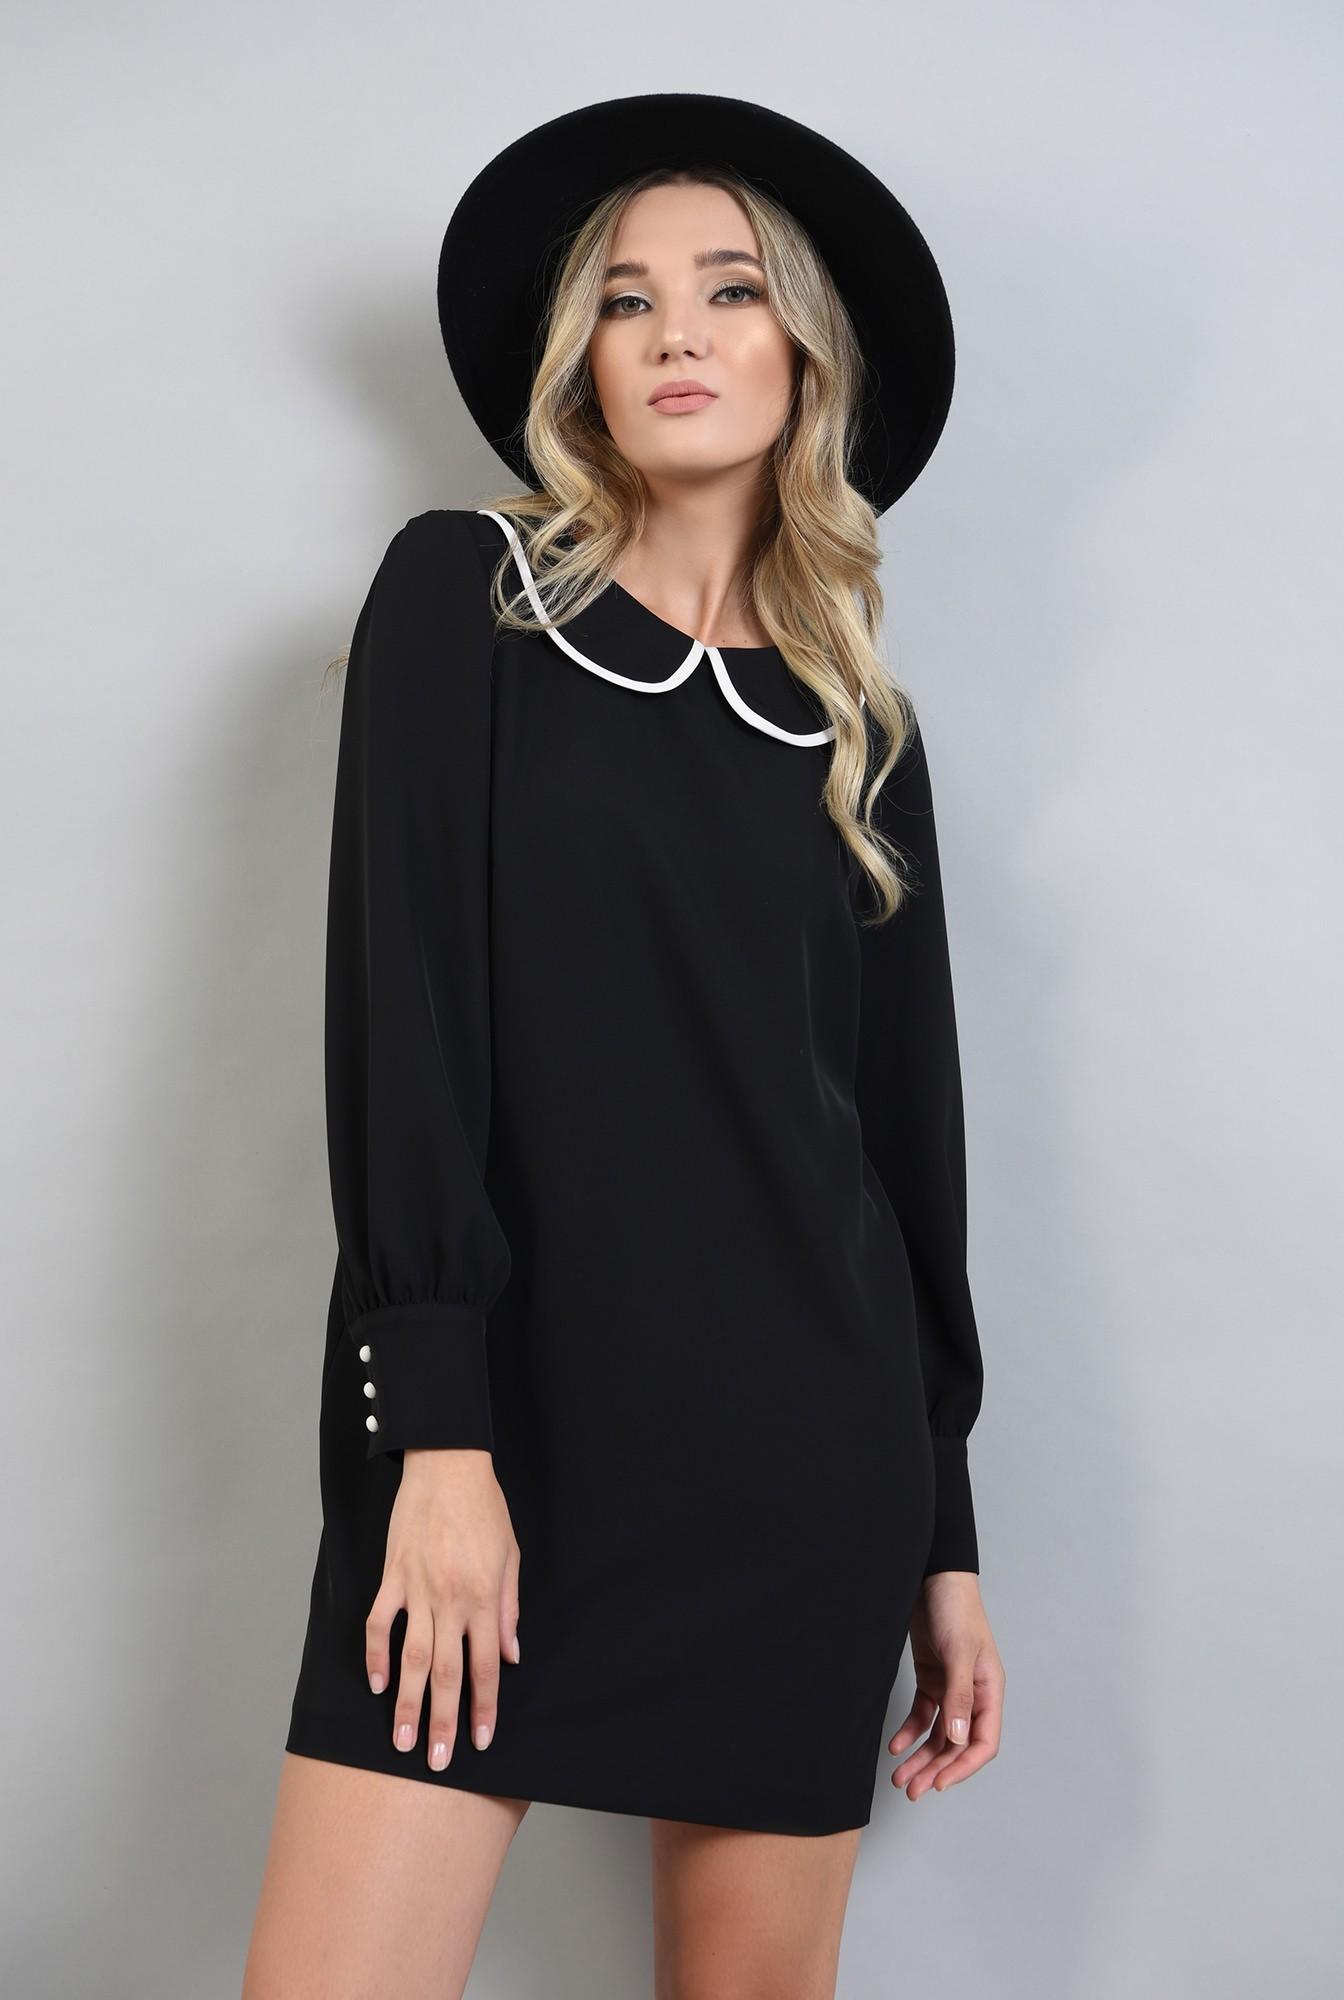 0 - rochie dreapta, casual, cu maneca lunga